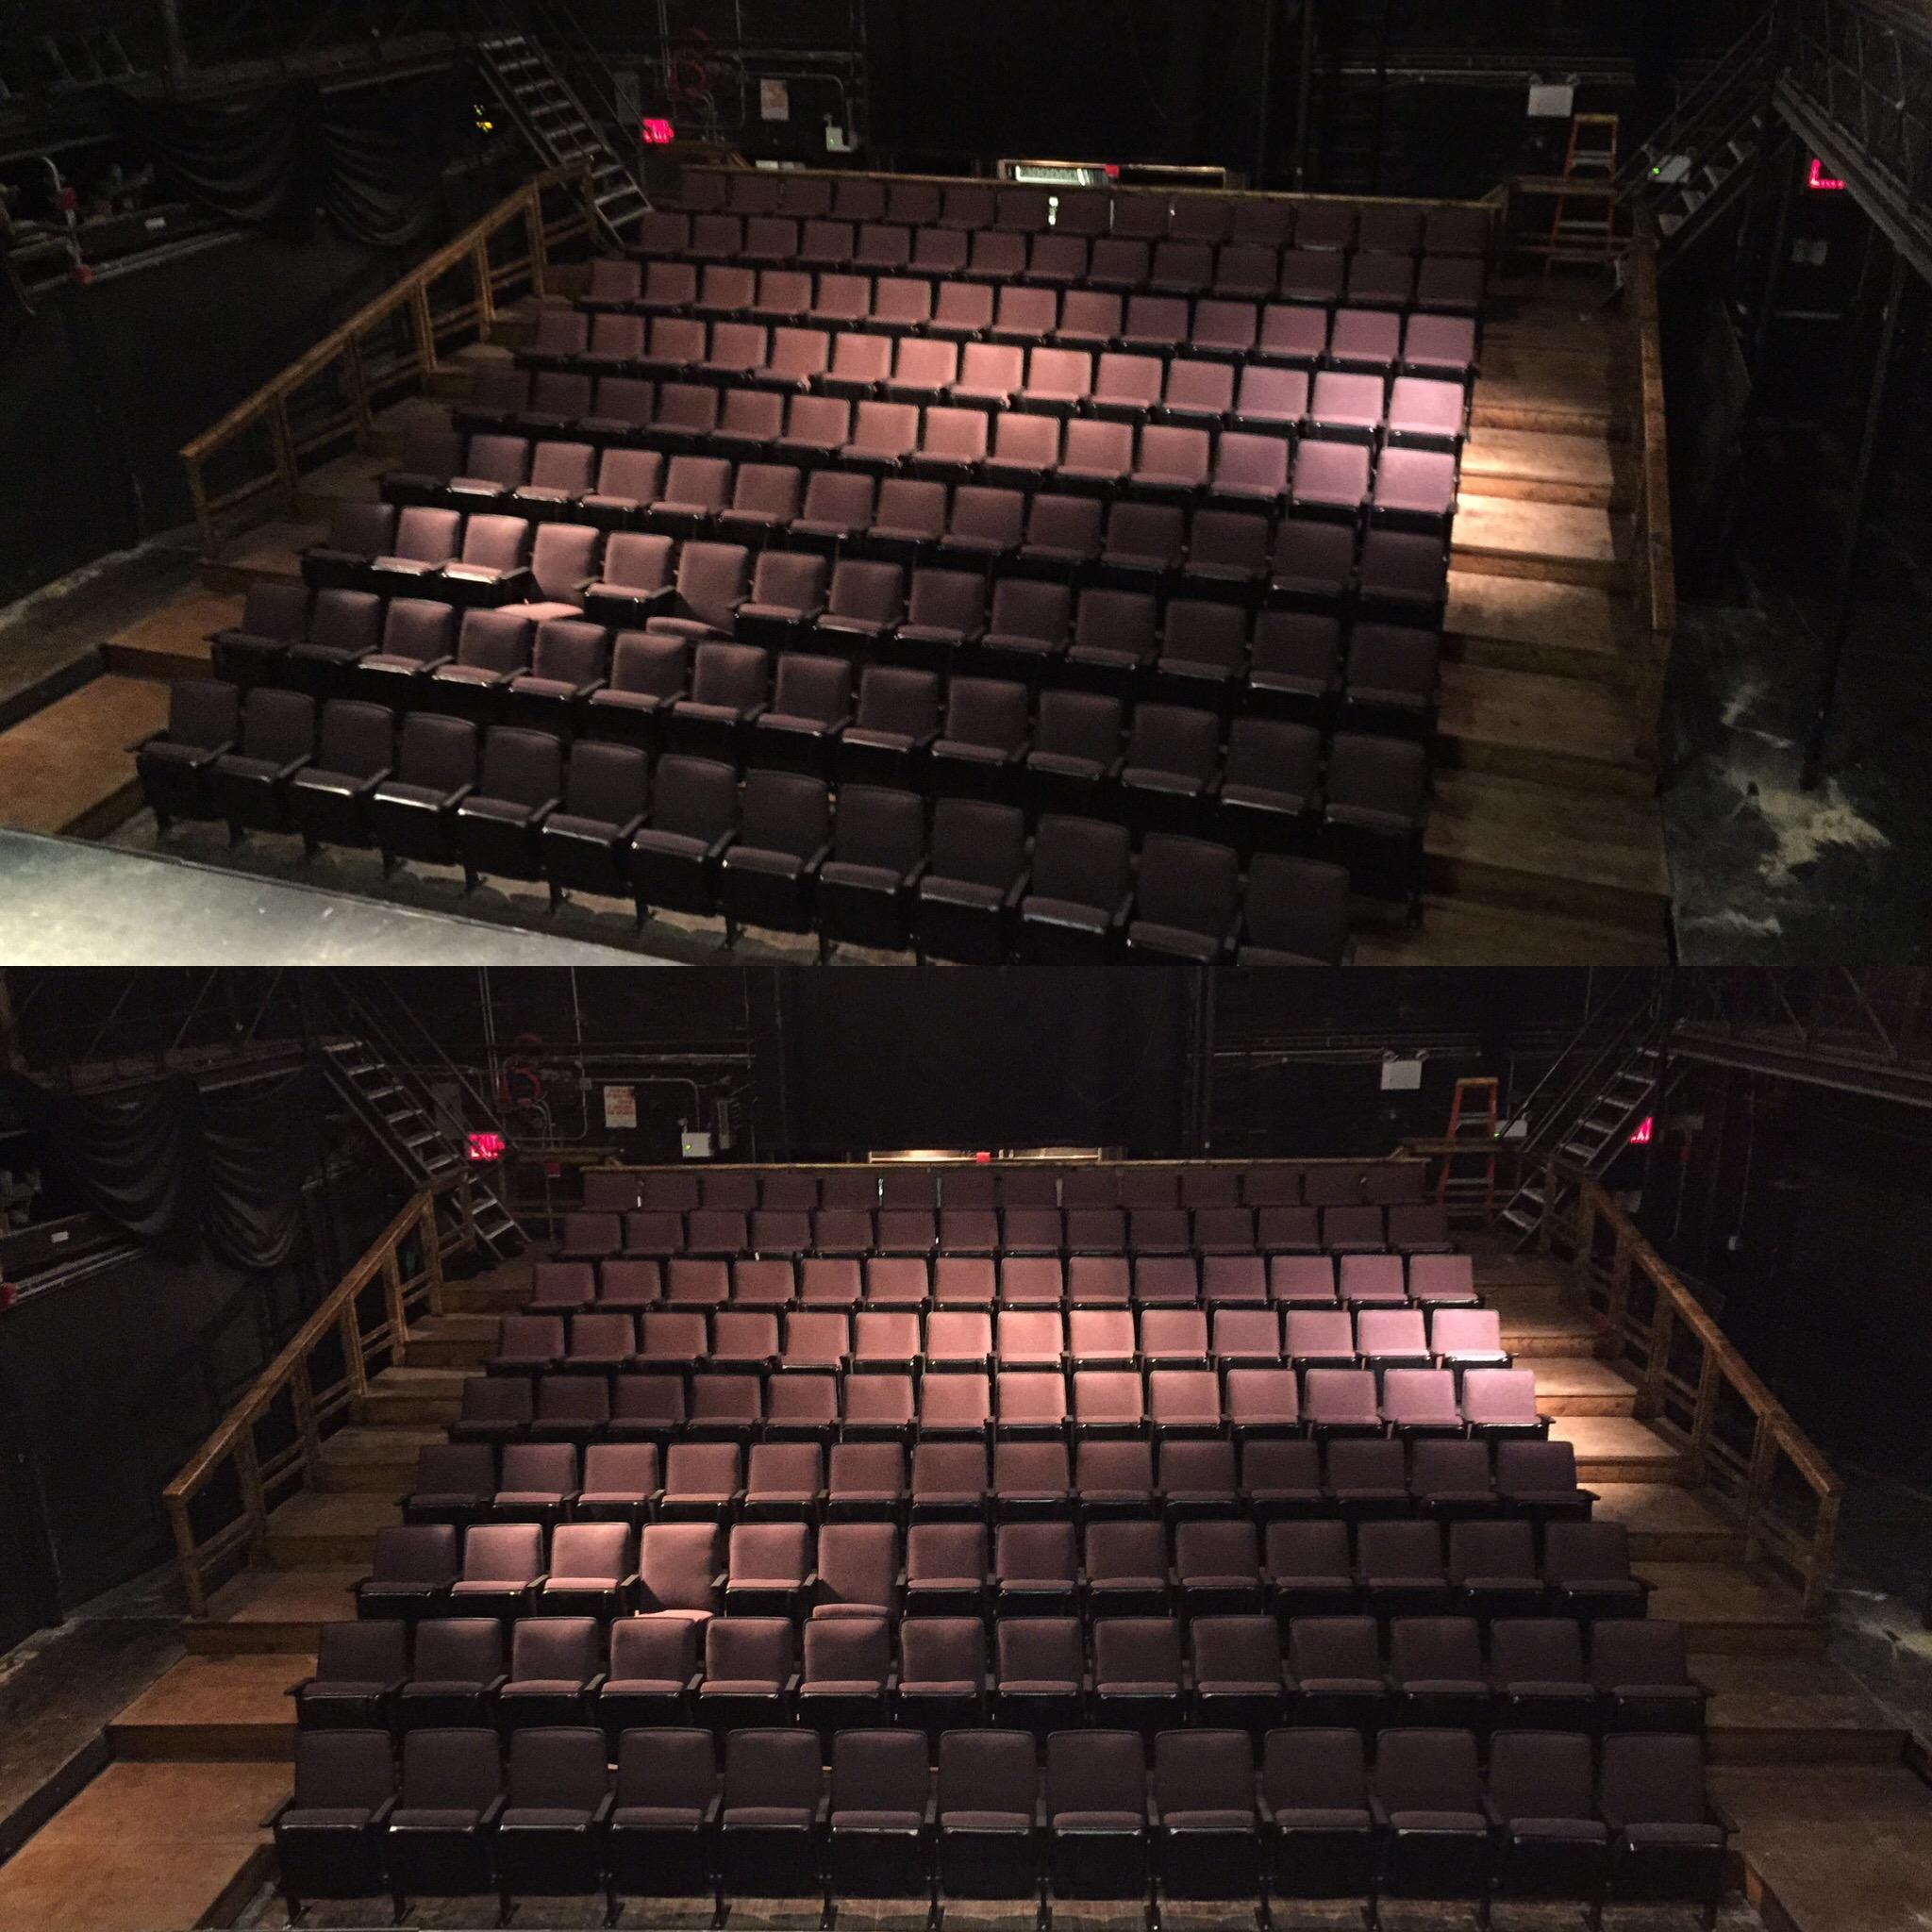 Chernuchin Theater Seating Renovation